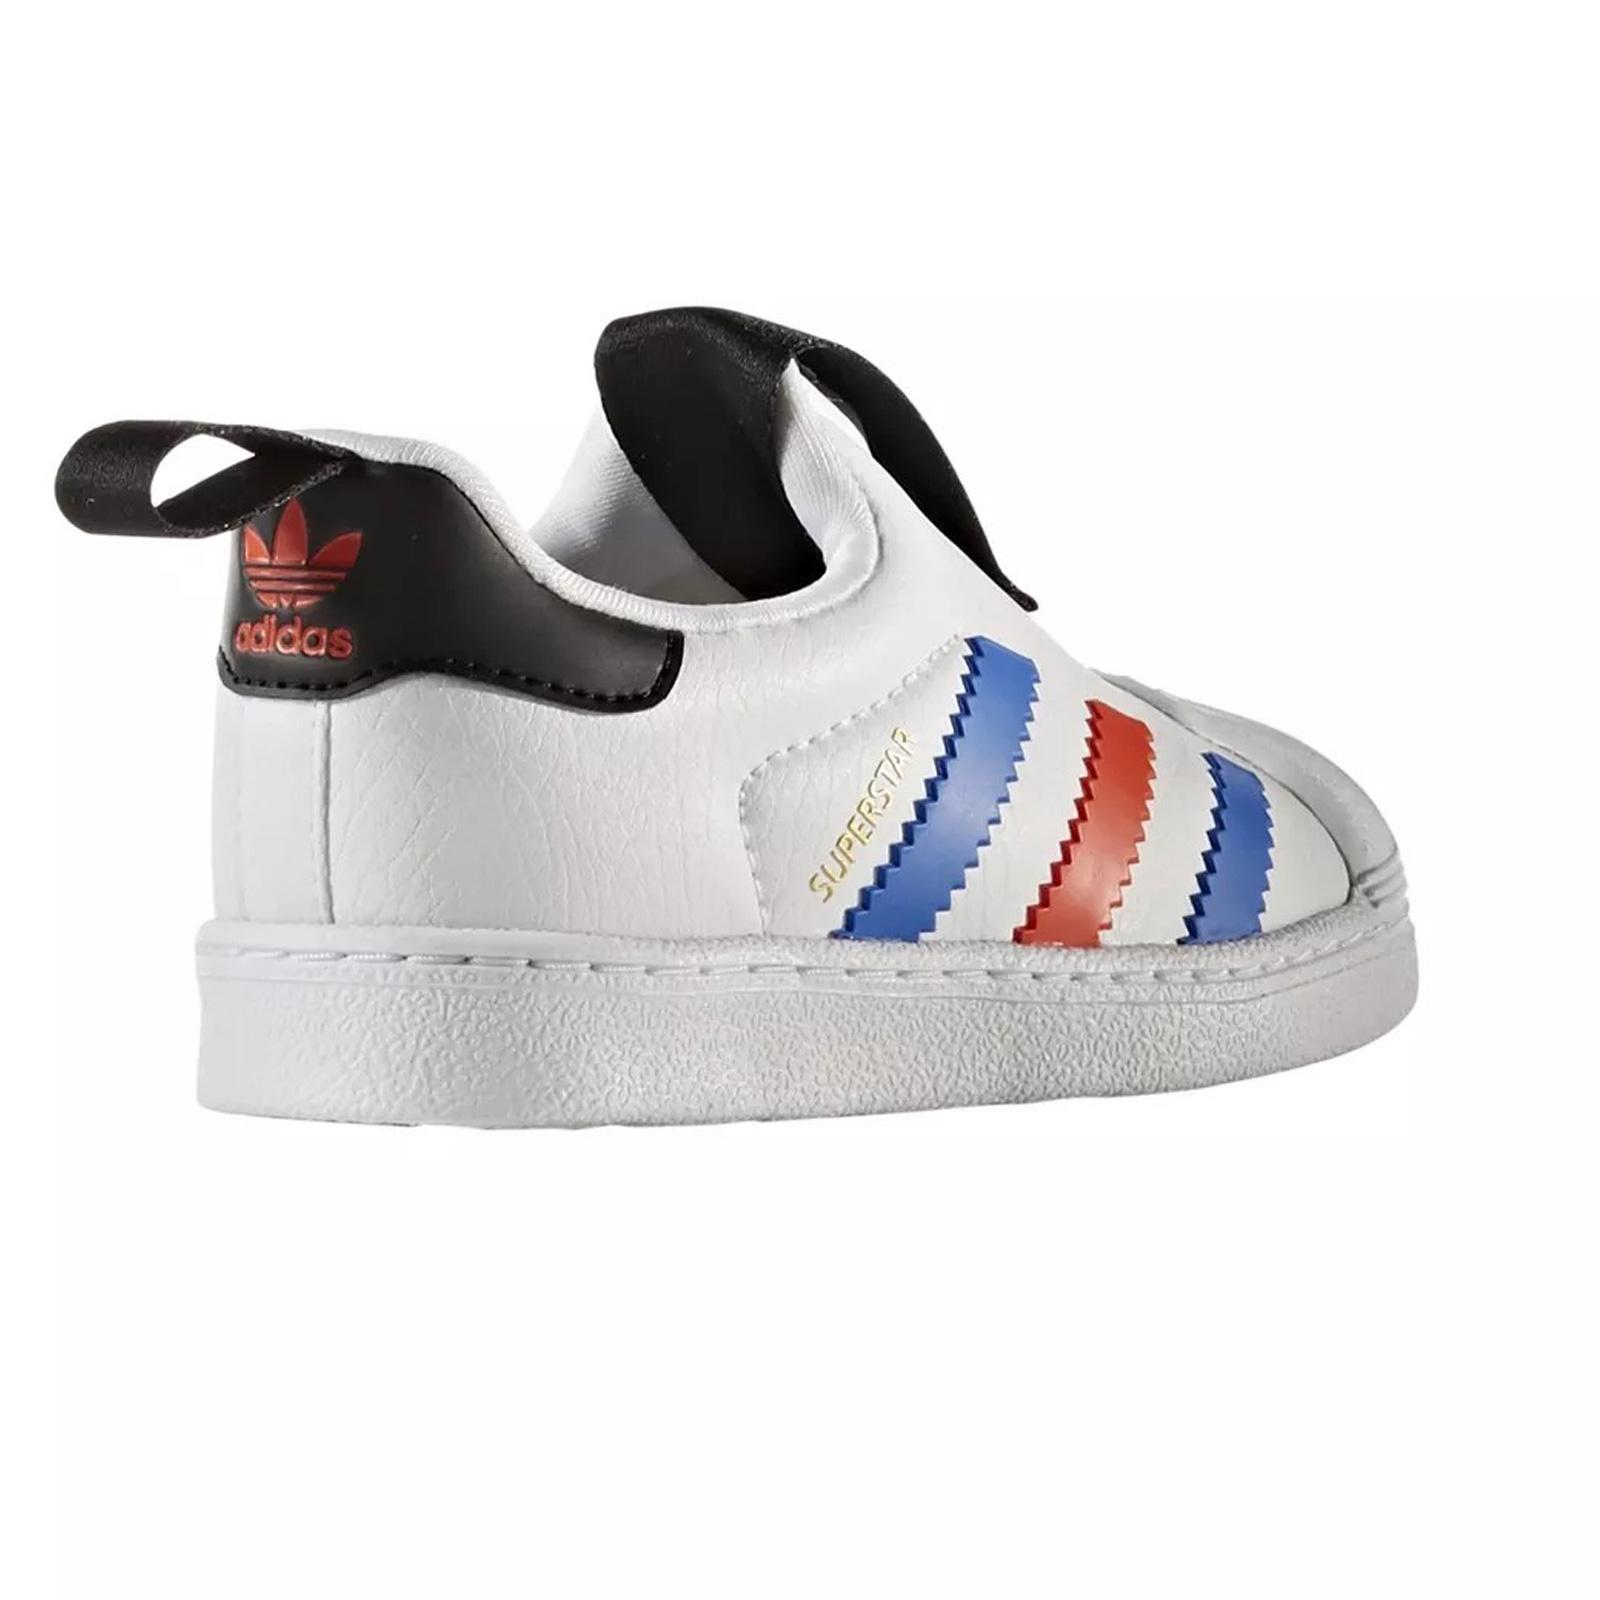 Details about Adidas Originals Superstar 360 Children Sneakers Sneaker Slip on White Red Blue